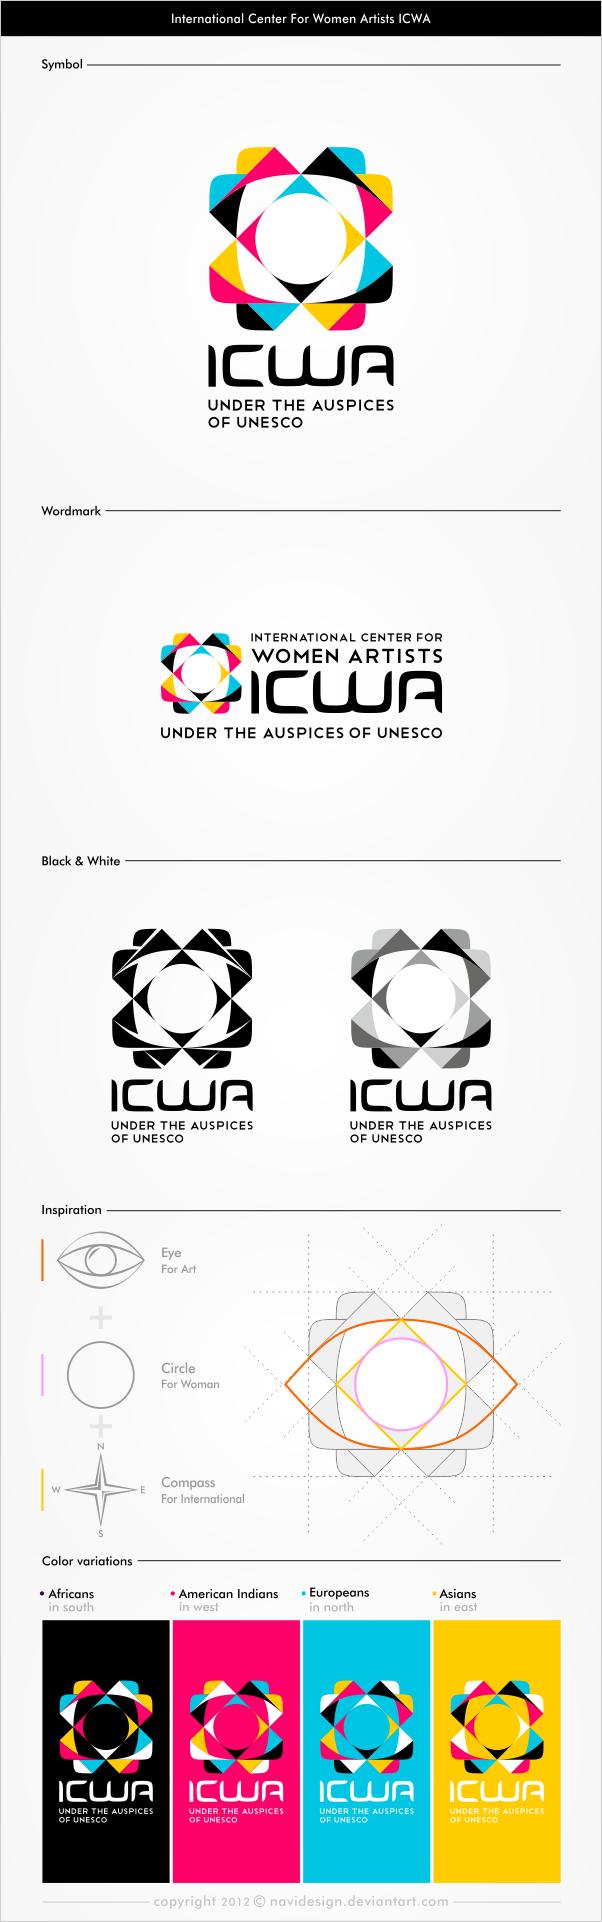 International Center for Women Artists ICWA by Navidesign